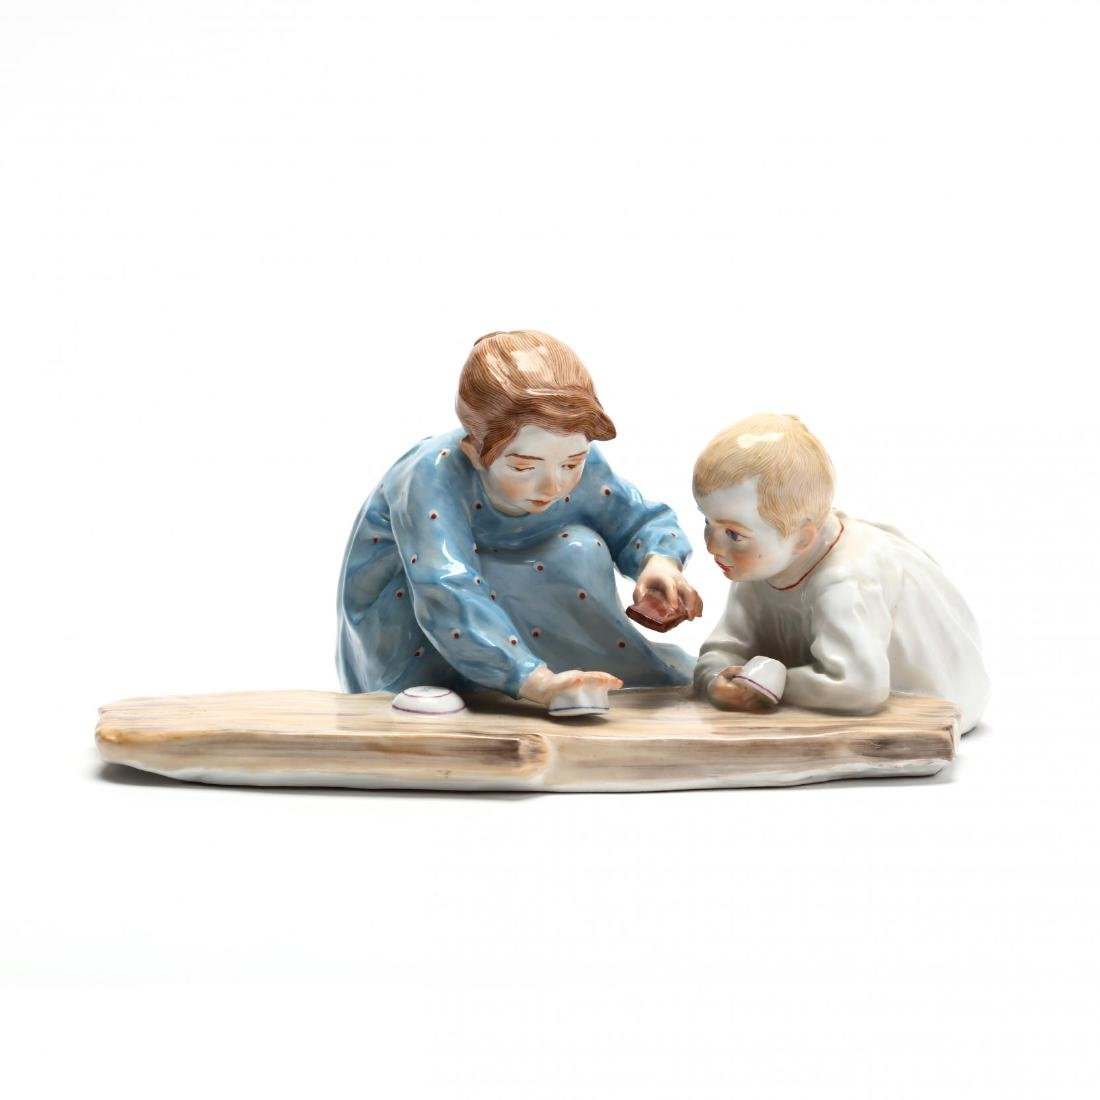 Meissen Hentschel Porcelain Figural Composition